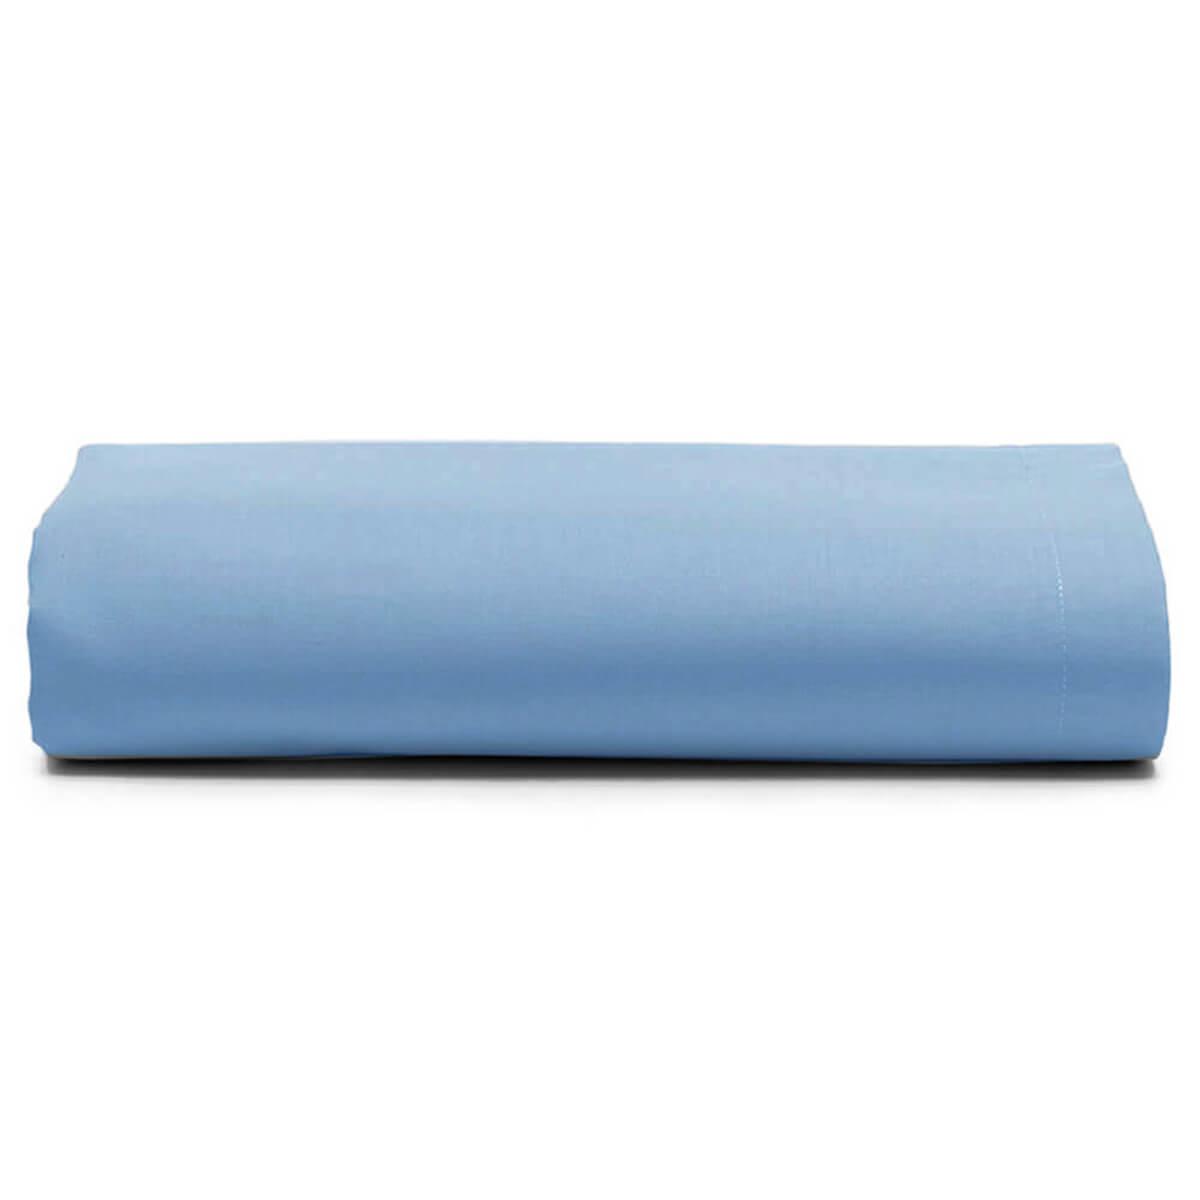 Lençol King Avulso 100% Algodão Royal Liso Azul